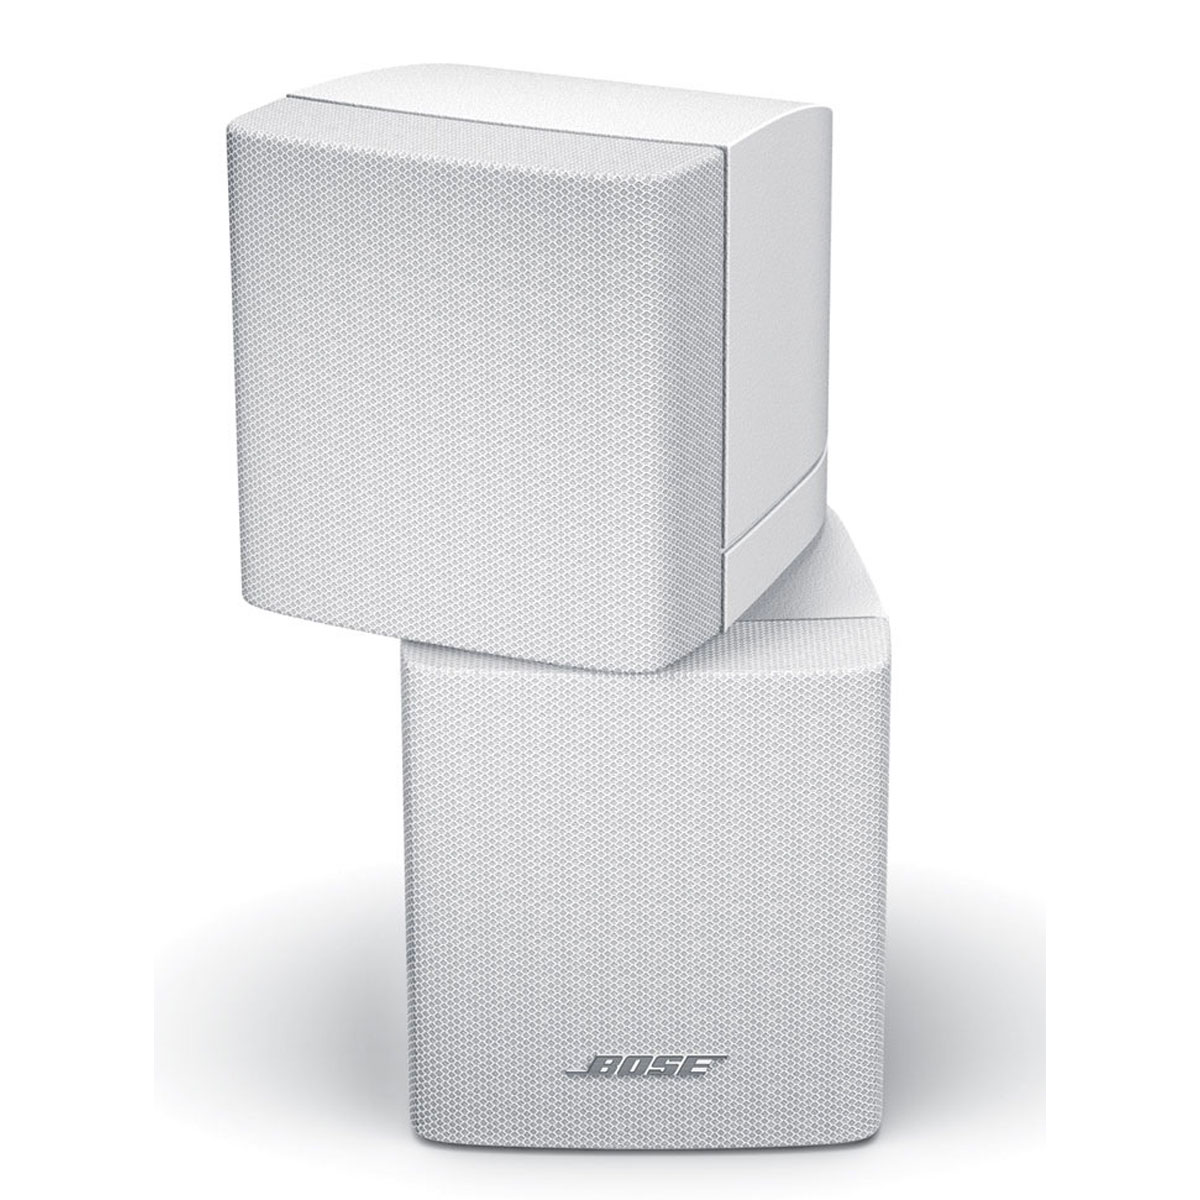 Bose Audio >> Bose Acoustimass 5 Série III Blanc - Enceintes Hifi Bose sur LDLC.com